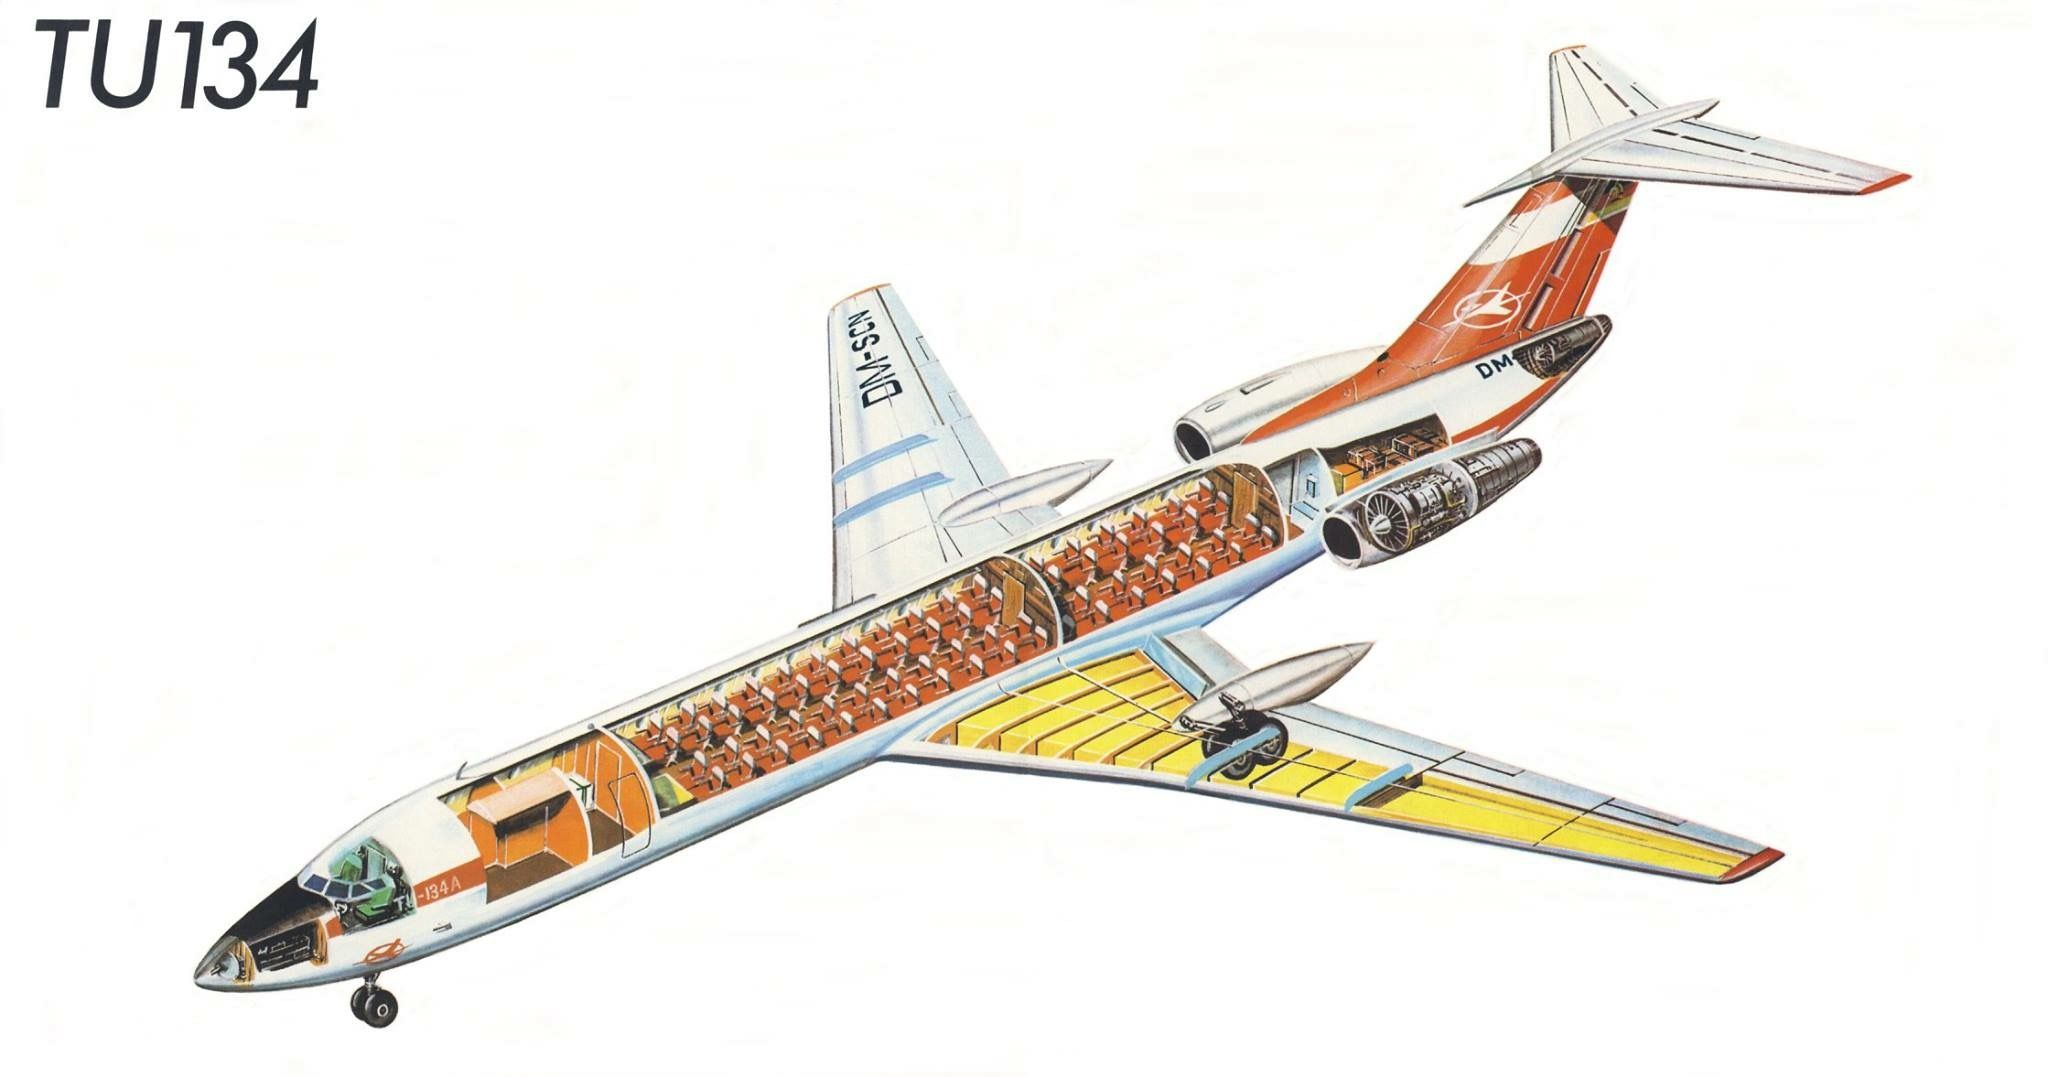 Cutaway of a pan am boeing 377 stratocruiser image from chris sloan - Ilyushin Il62 1 Airliner Cutaways Pinterest Ilyushin Il 62 Cutaway And Aircraft